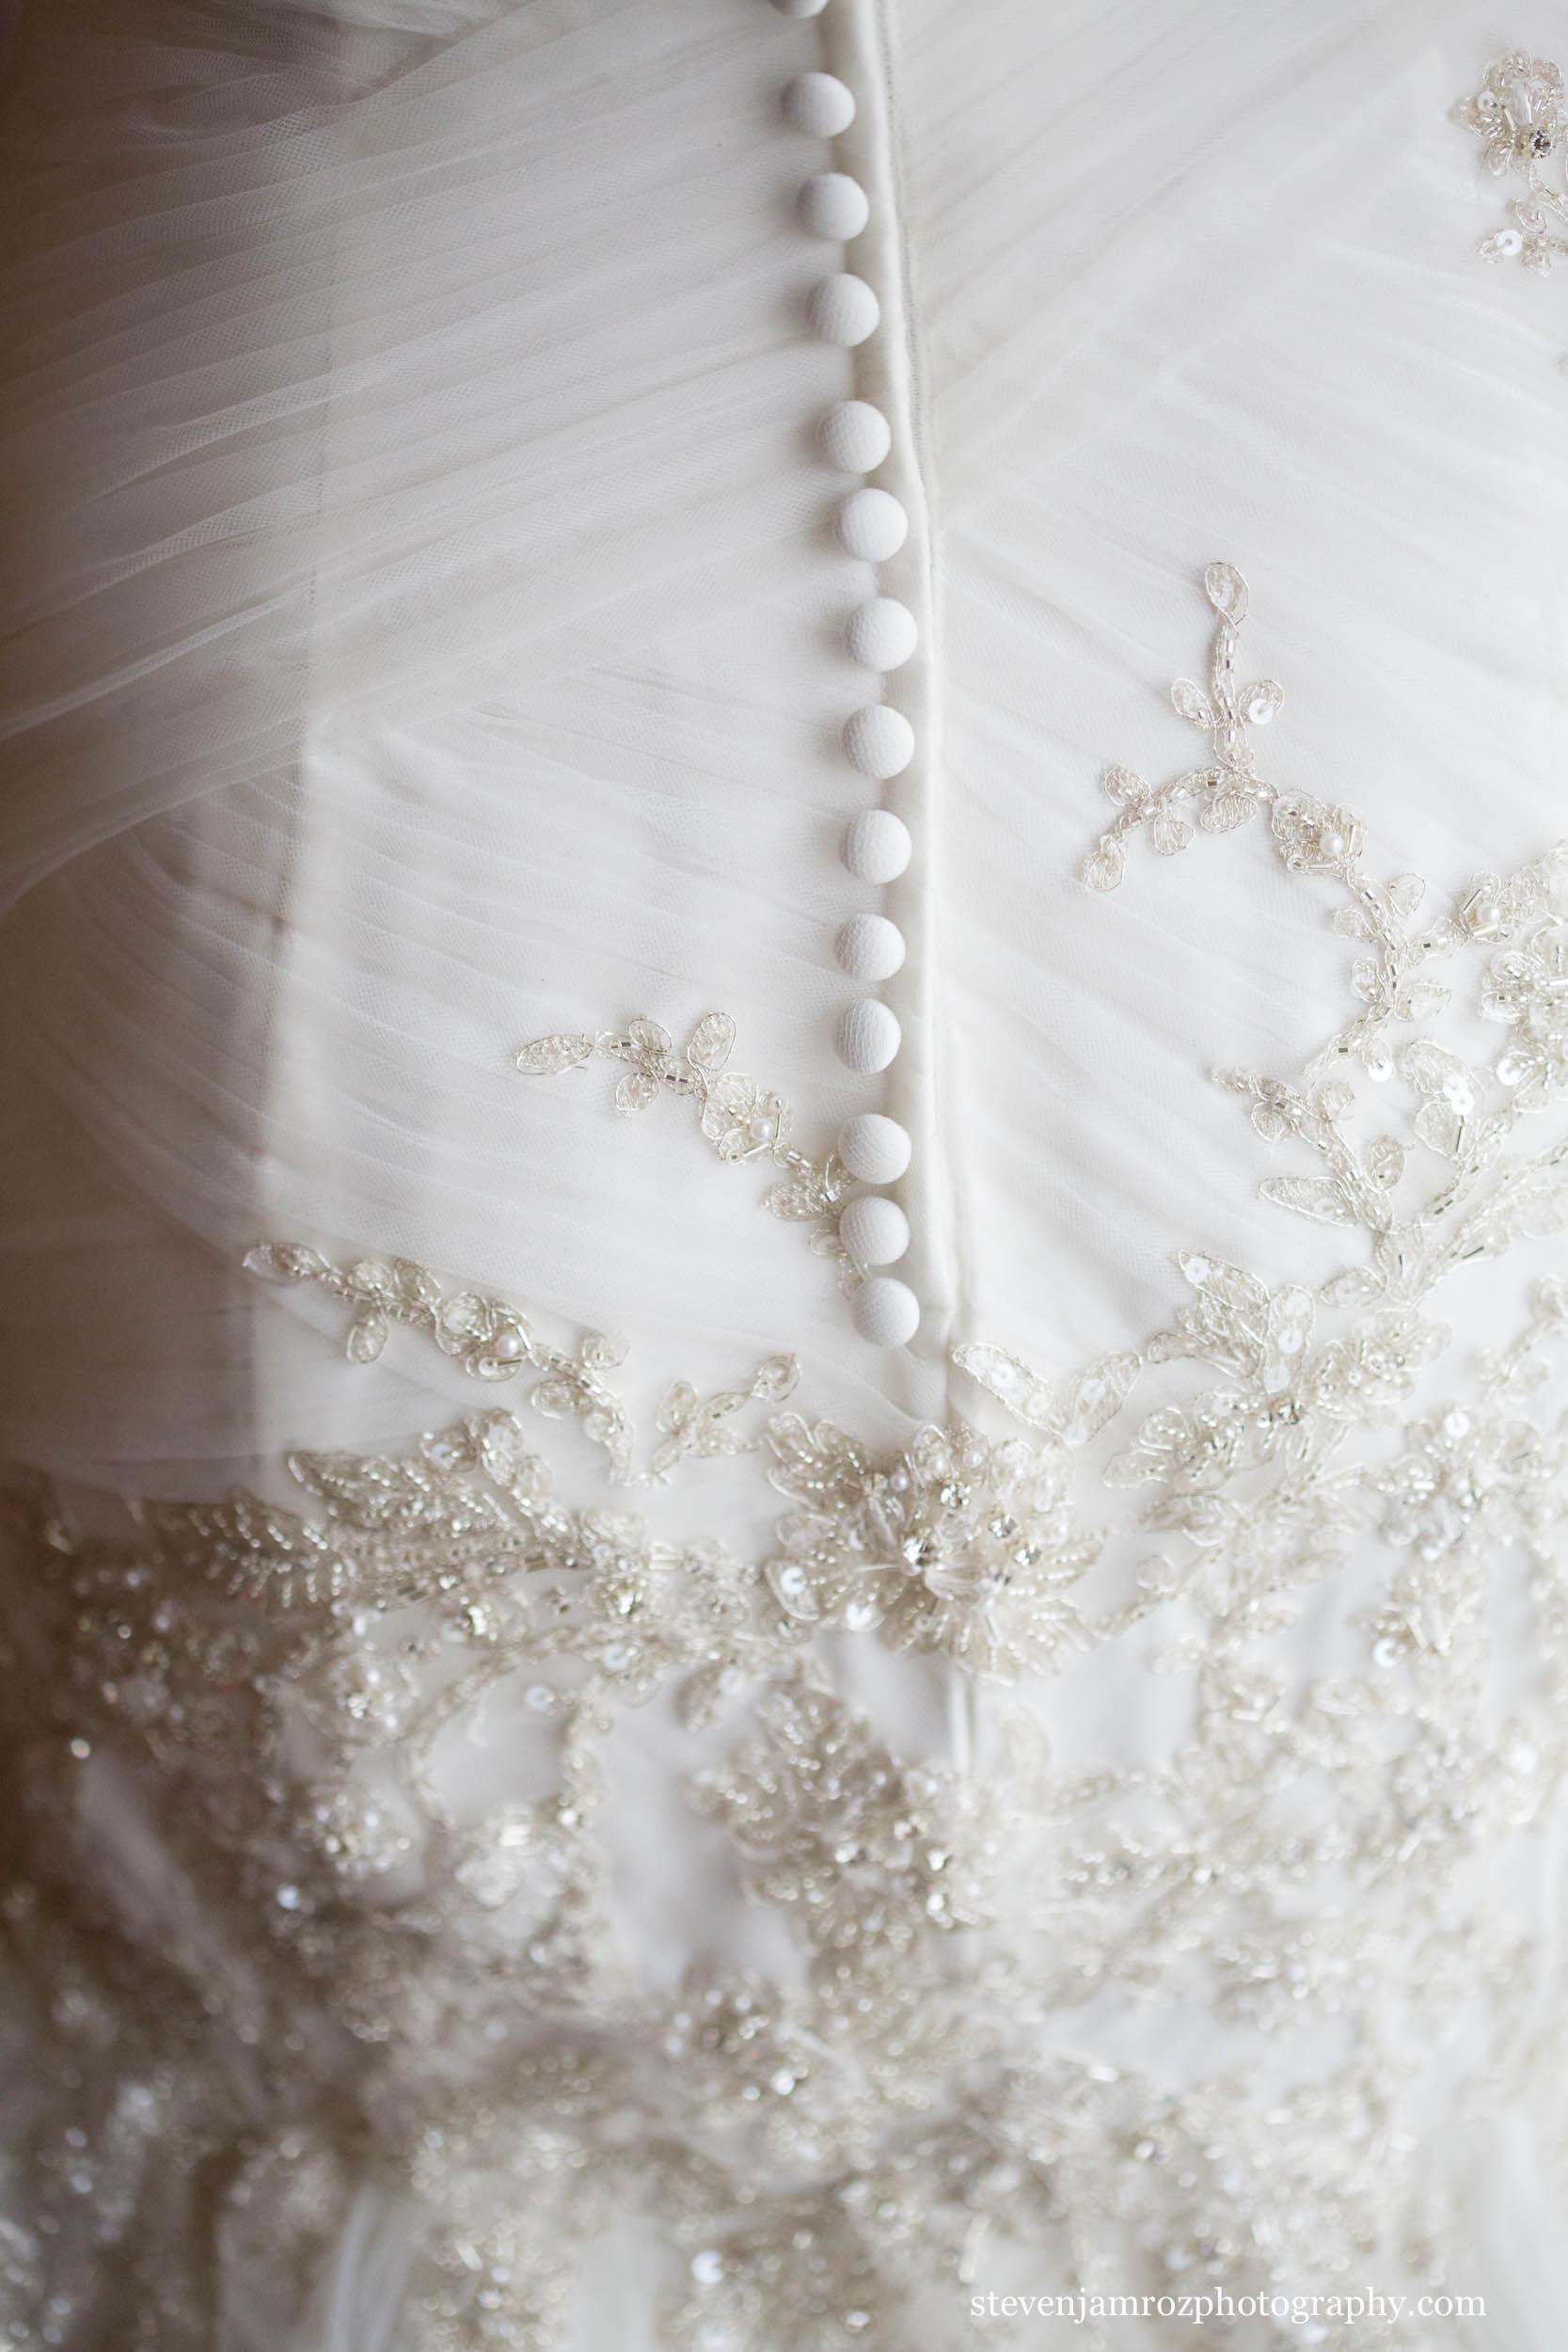 detail-photo-wedding-dress-raleigh-nc-steven-jamroz-photography-0145.jpg